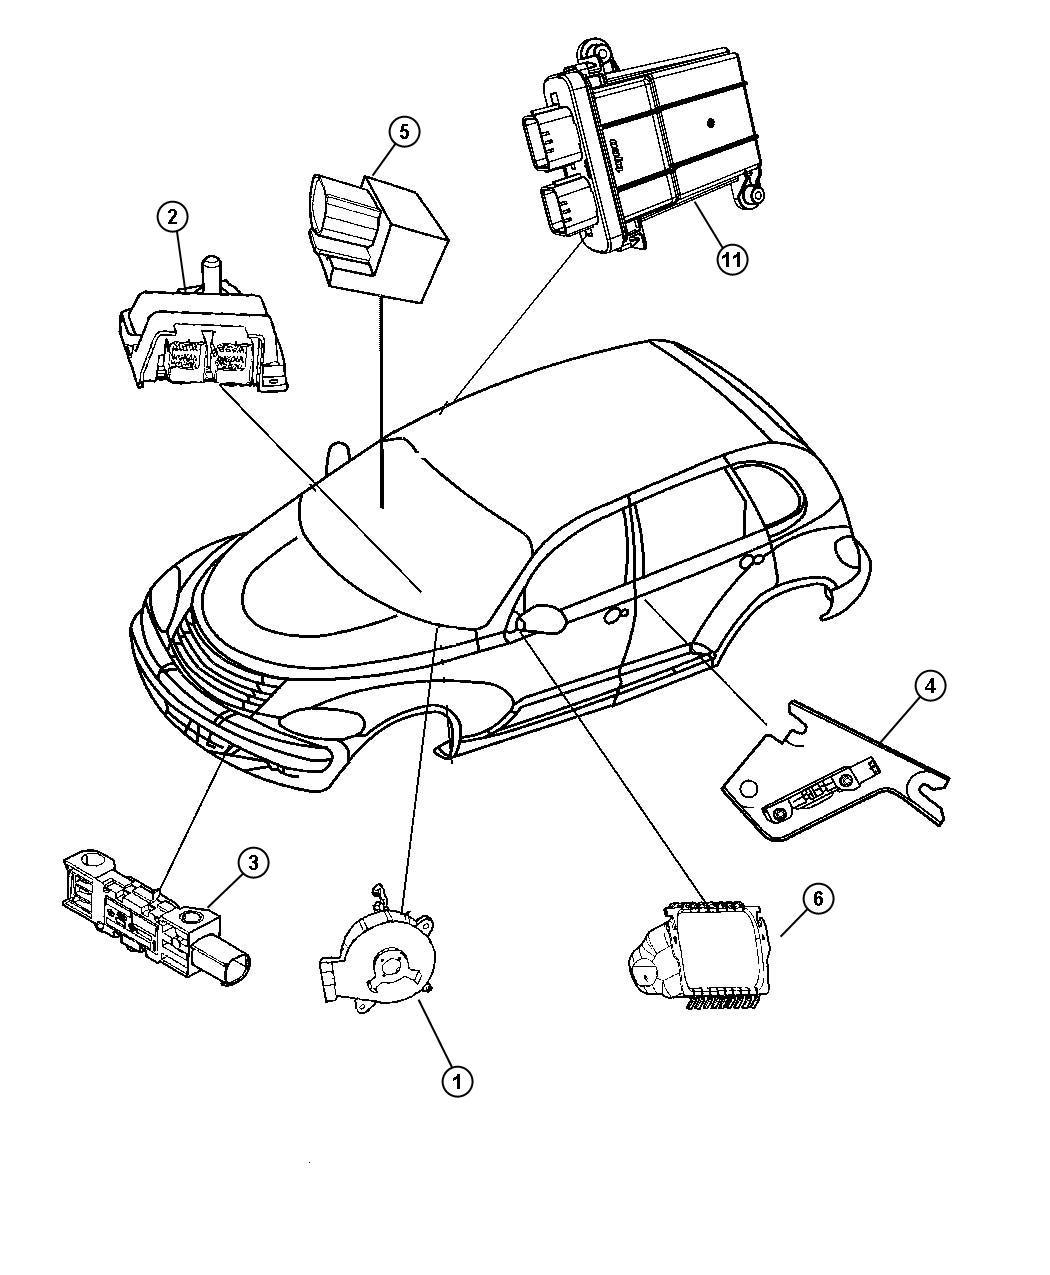 Chrysler Pt Cruiser Air Bag Modules, Impact Sensors and